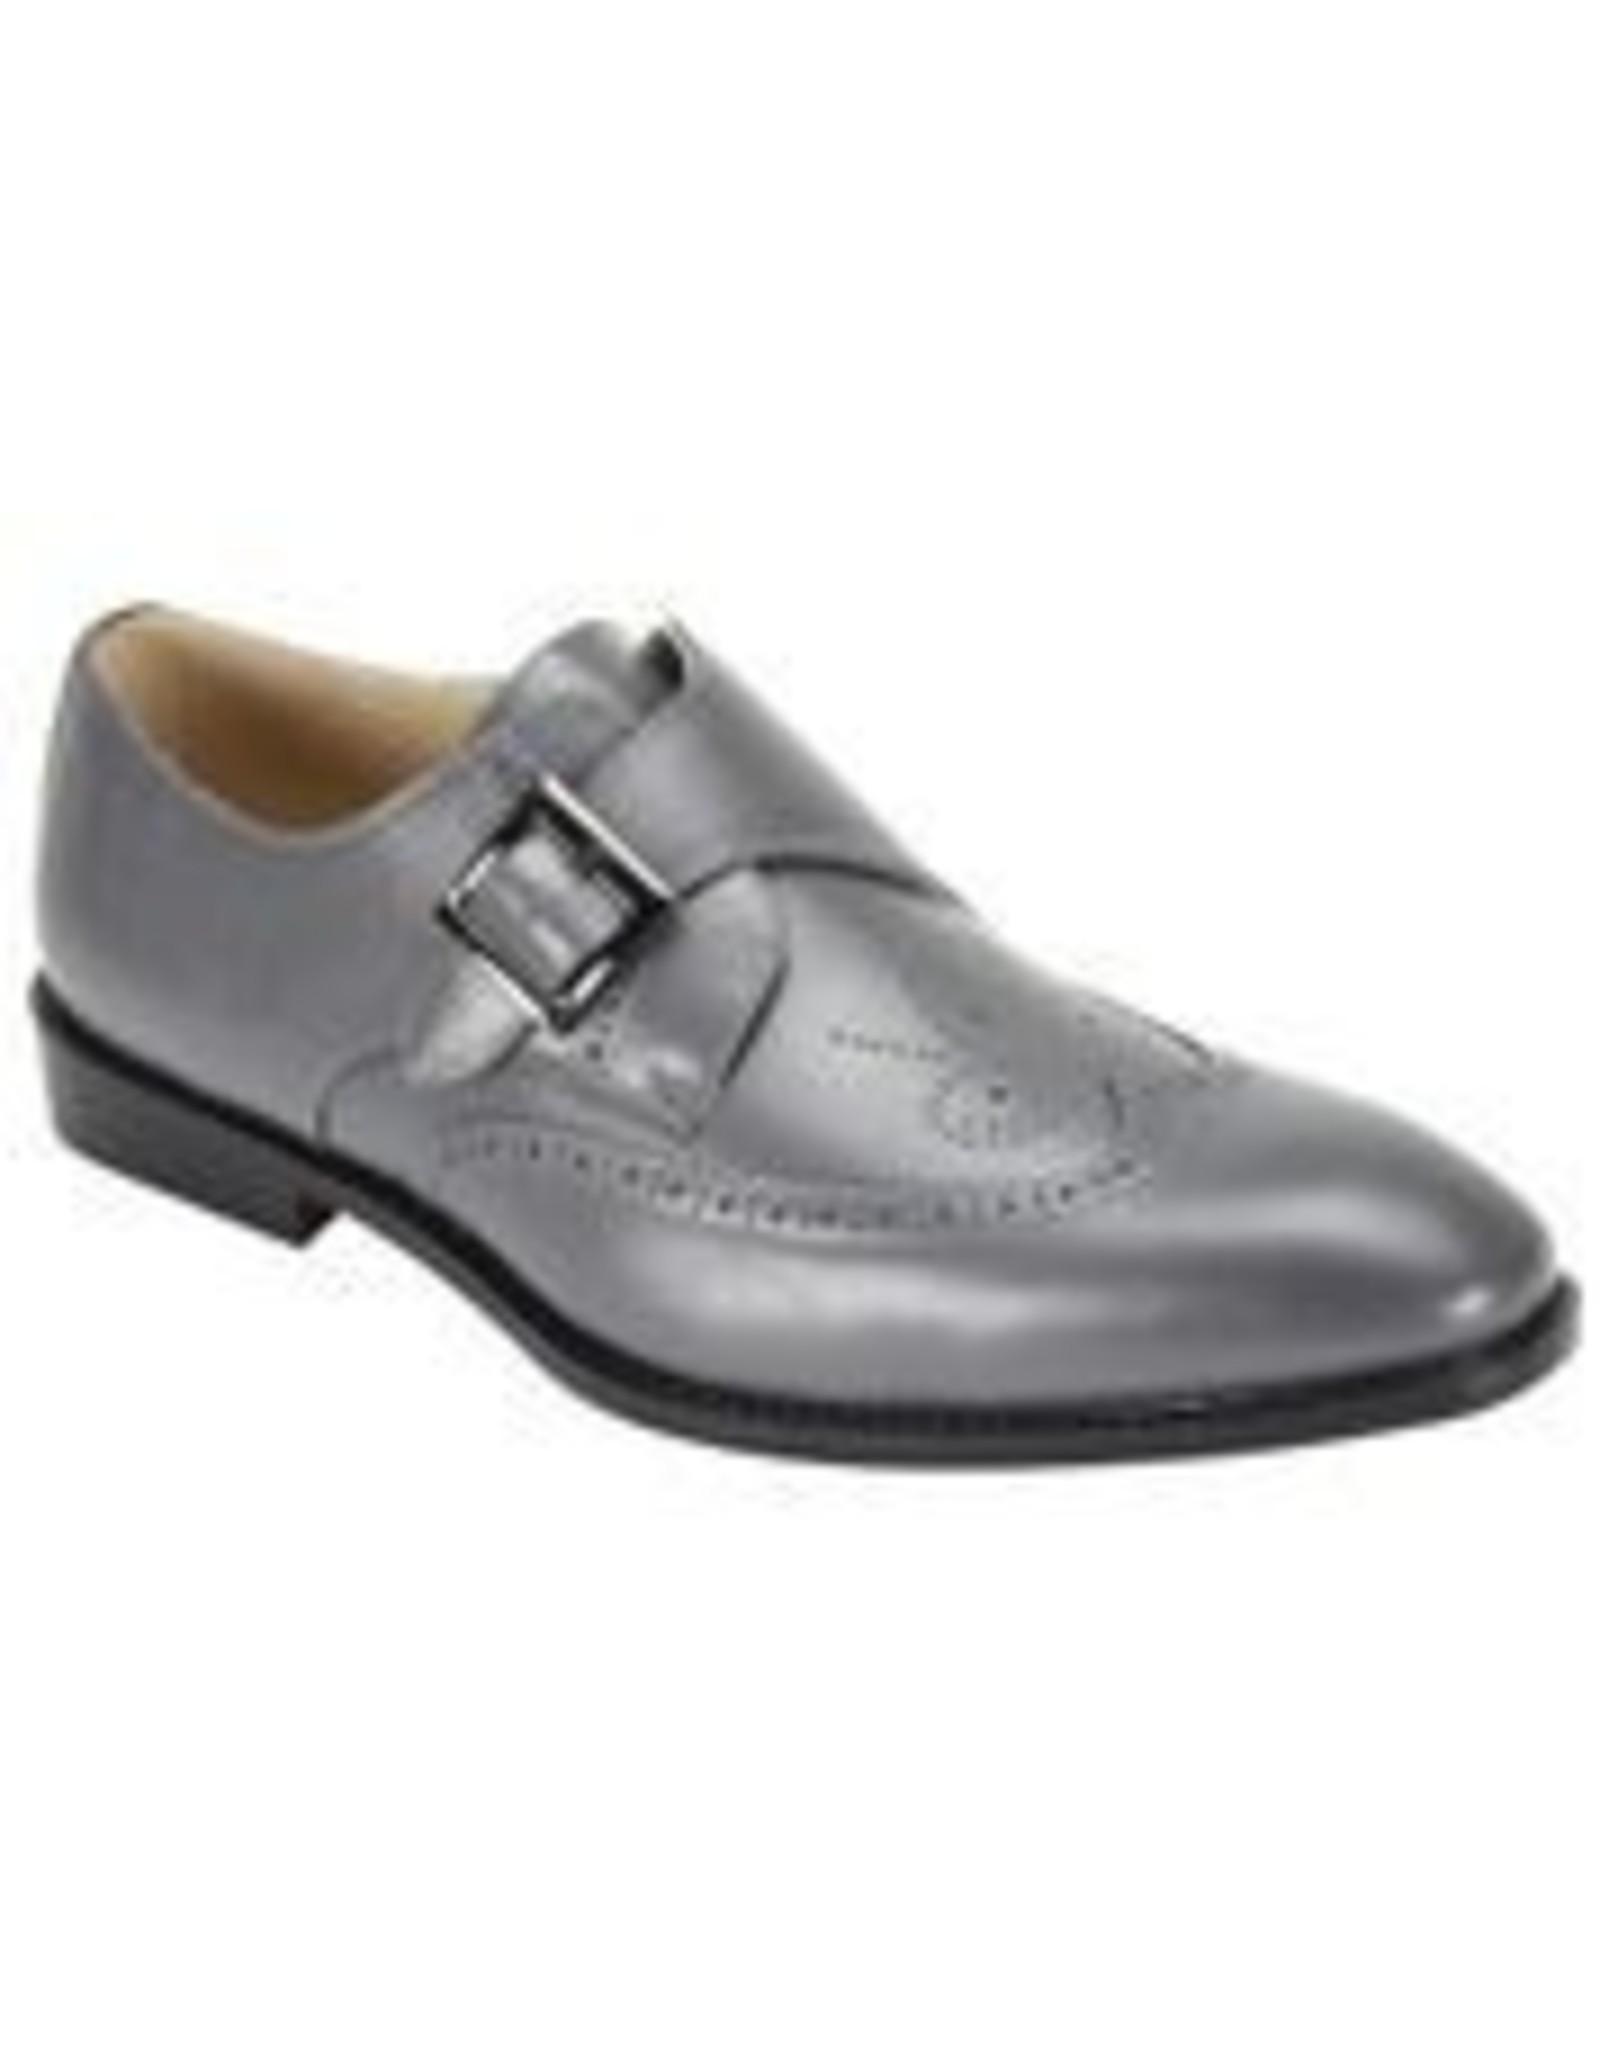 Antonio Cerrelli Antonio Cerrelli 6837 Dress Shoe - Gray